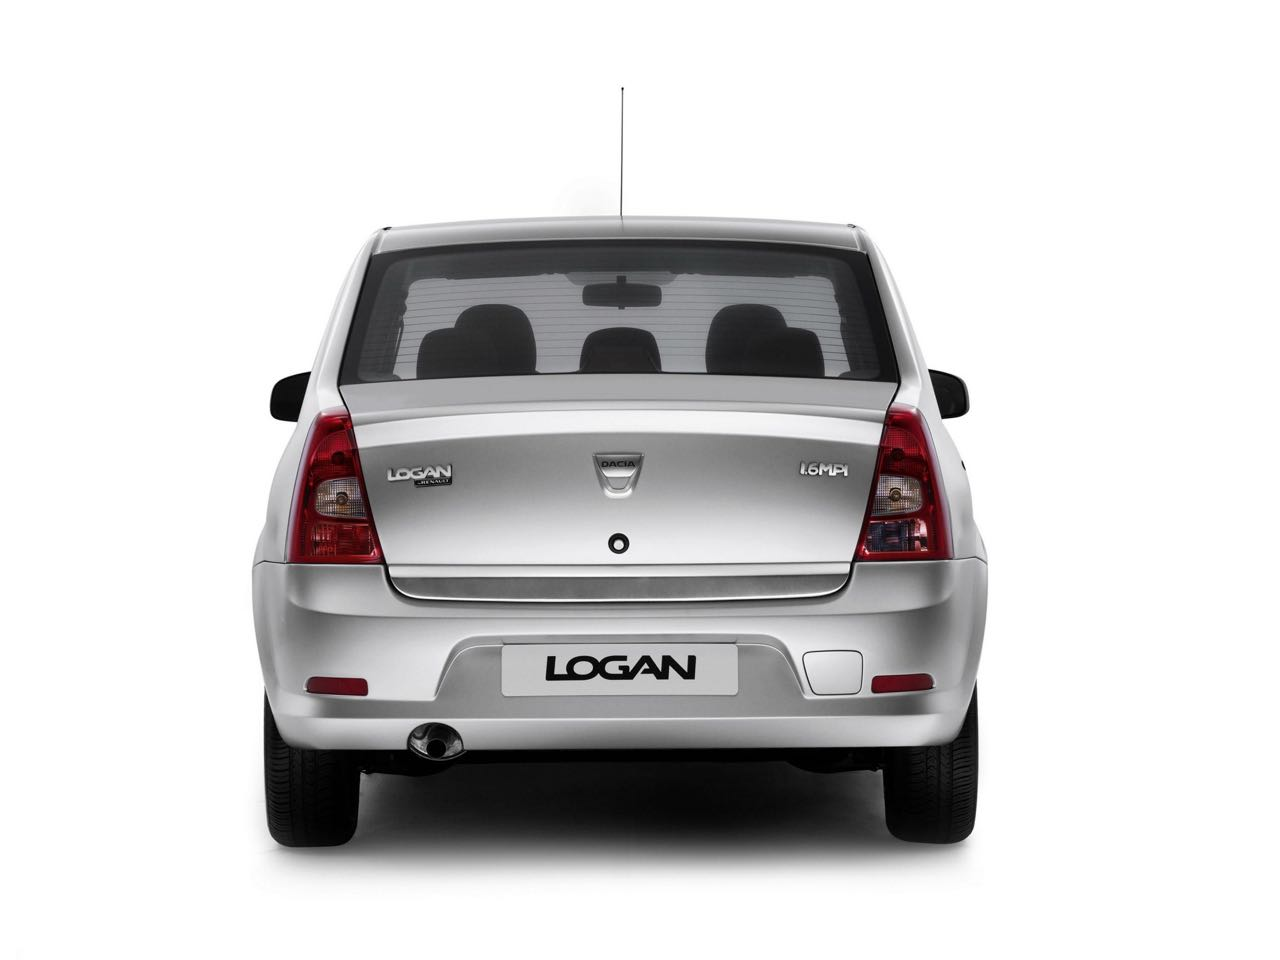 Dacia Logan 2009 trasera